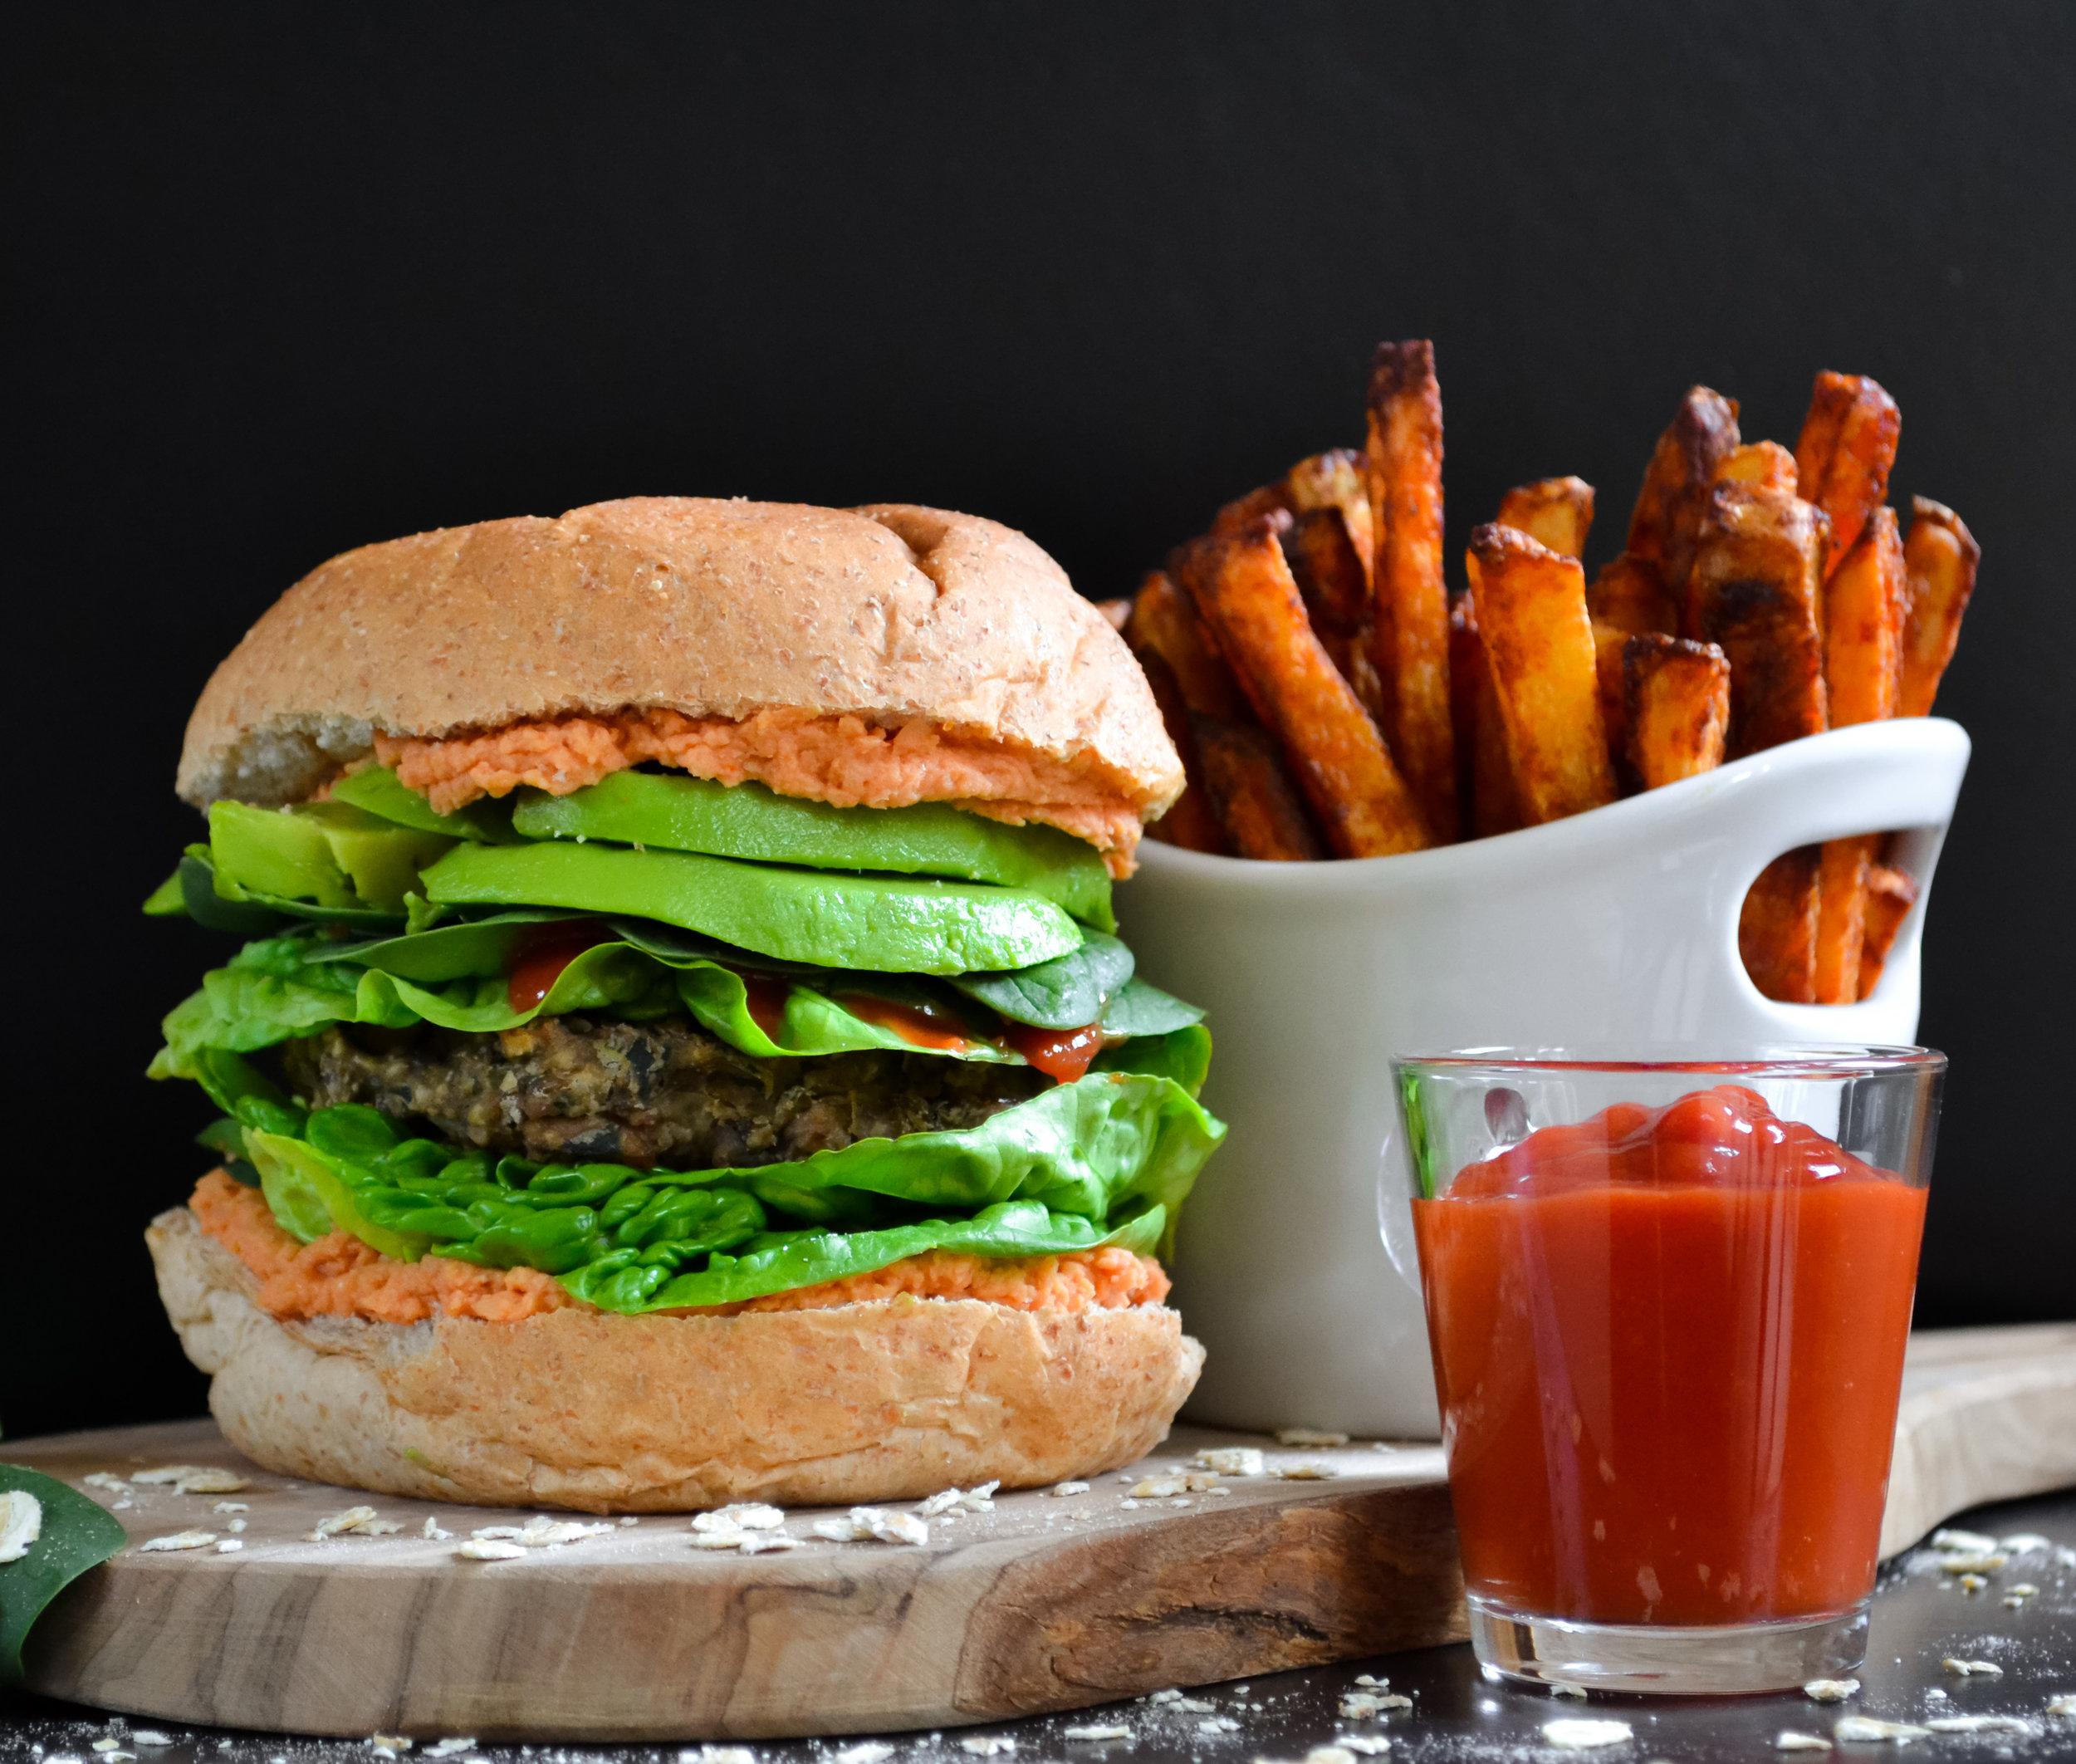 Mushroom, Lentil and Spinach Vegan Burger with Paprika Fries